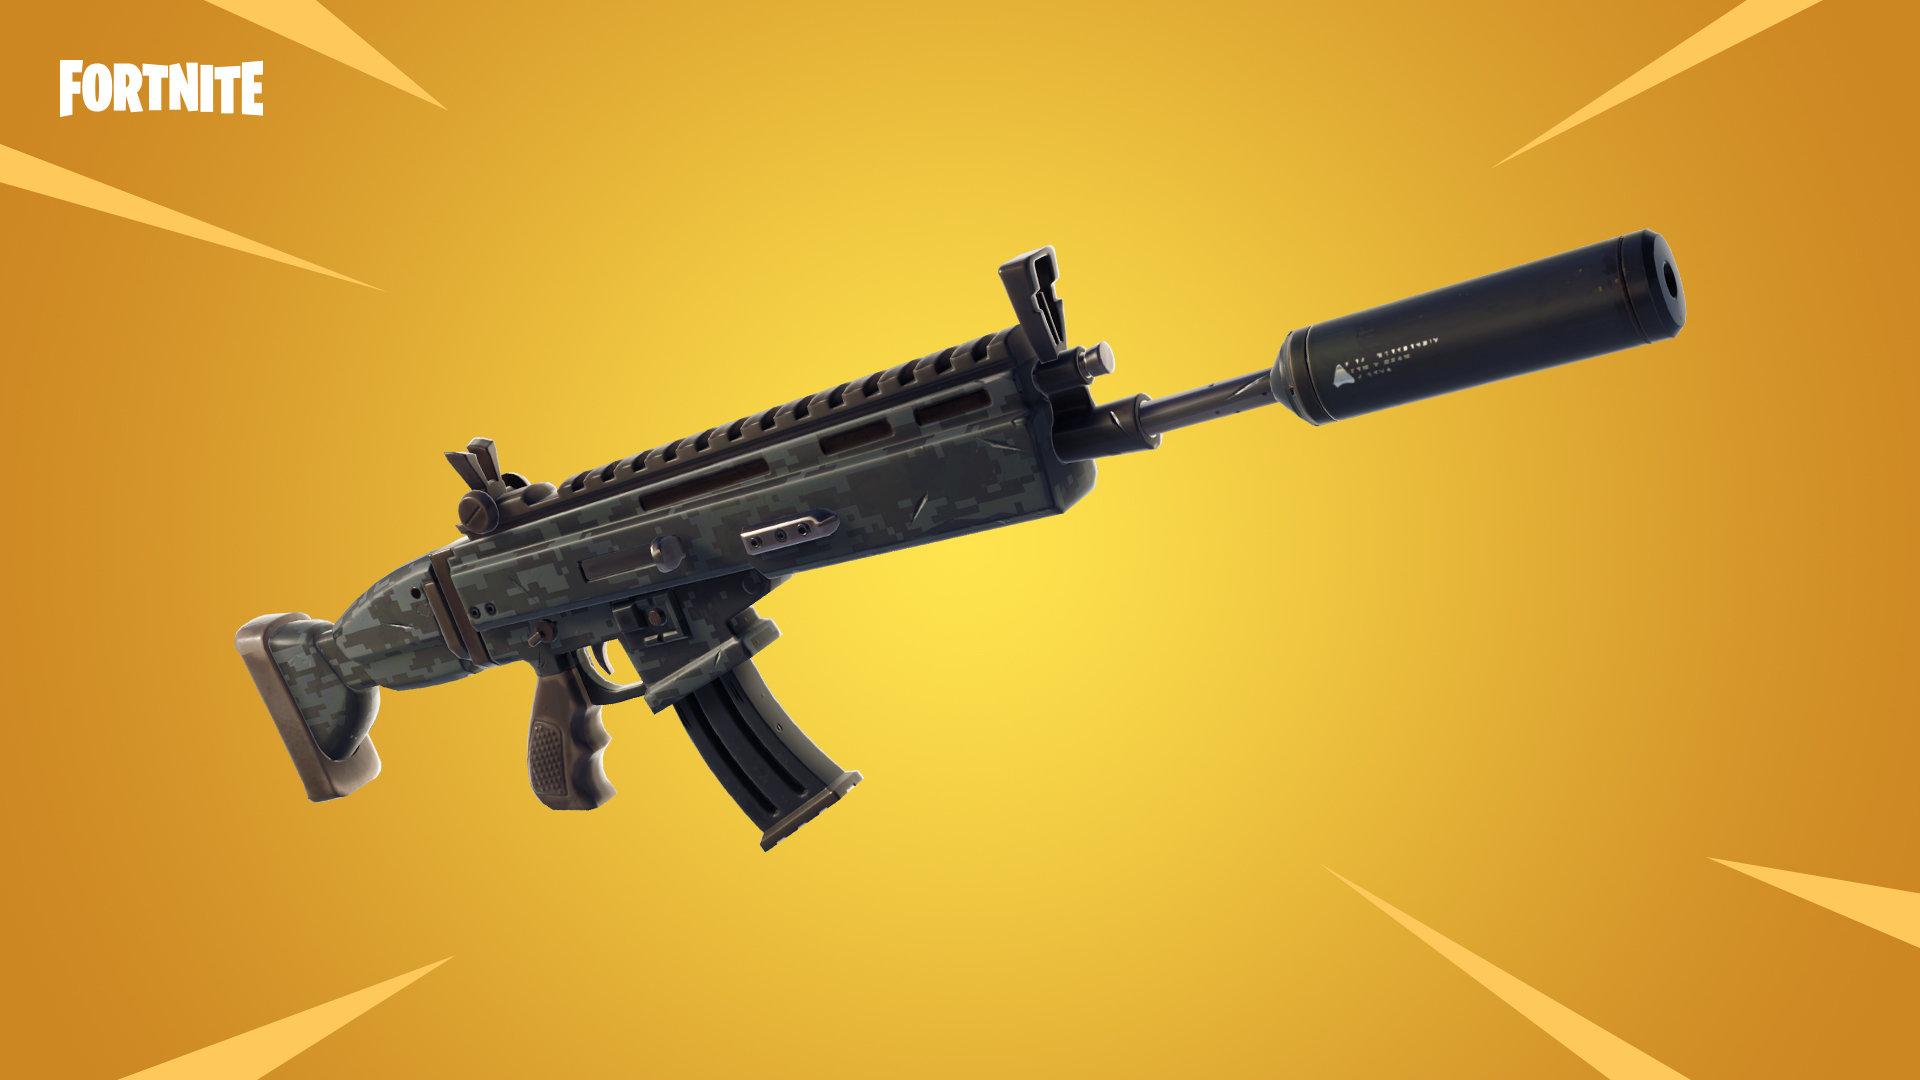 record: העדכון החדש של Fortnite מביא איתו נשק חדש בתמורה לנשק אהוב אחר cover image